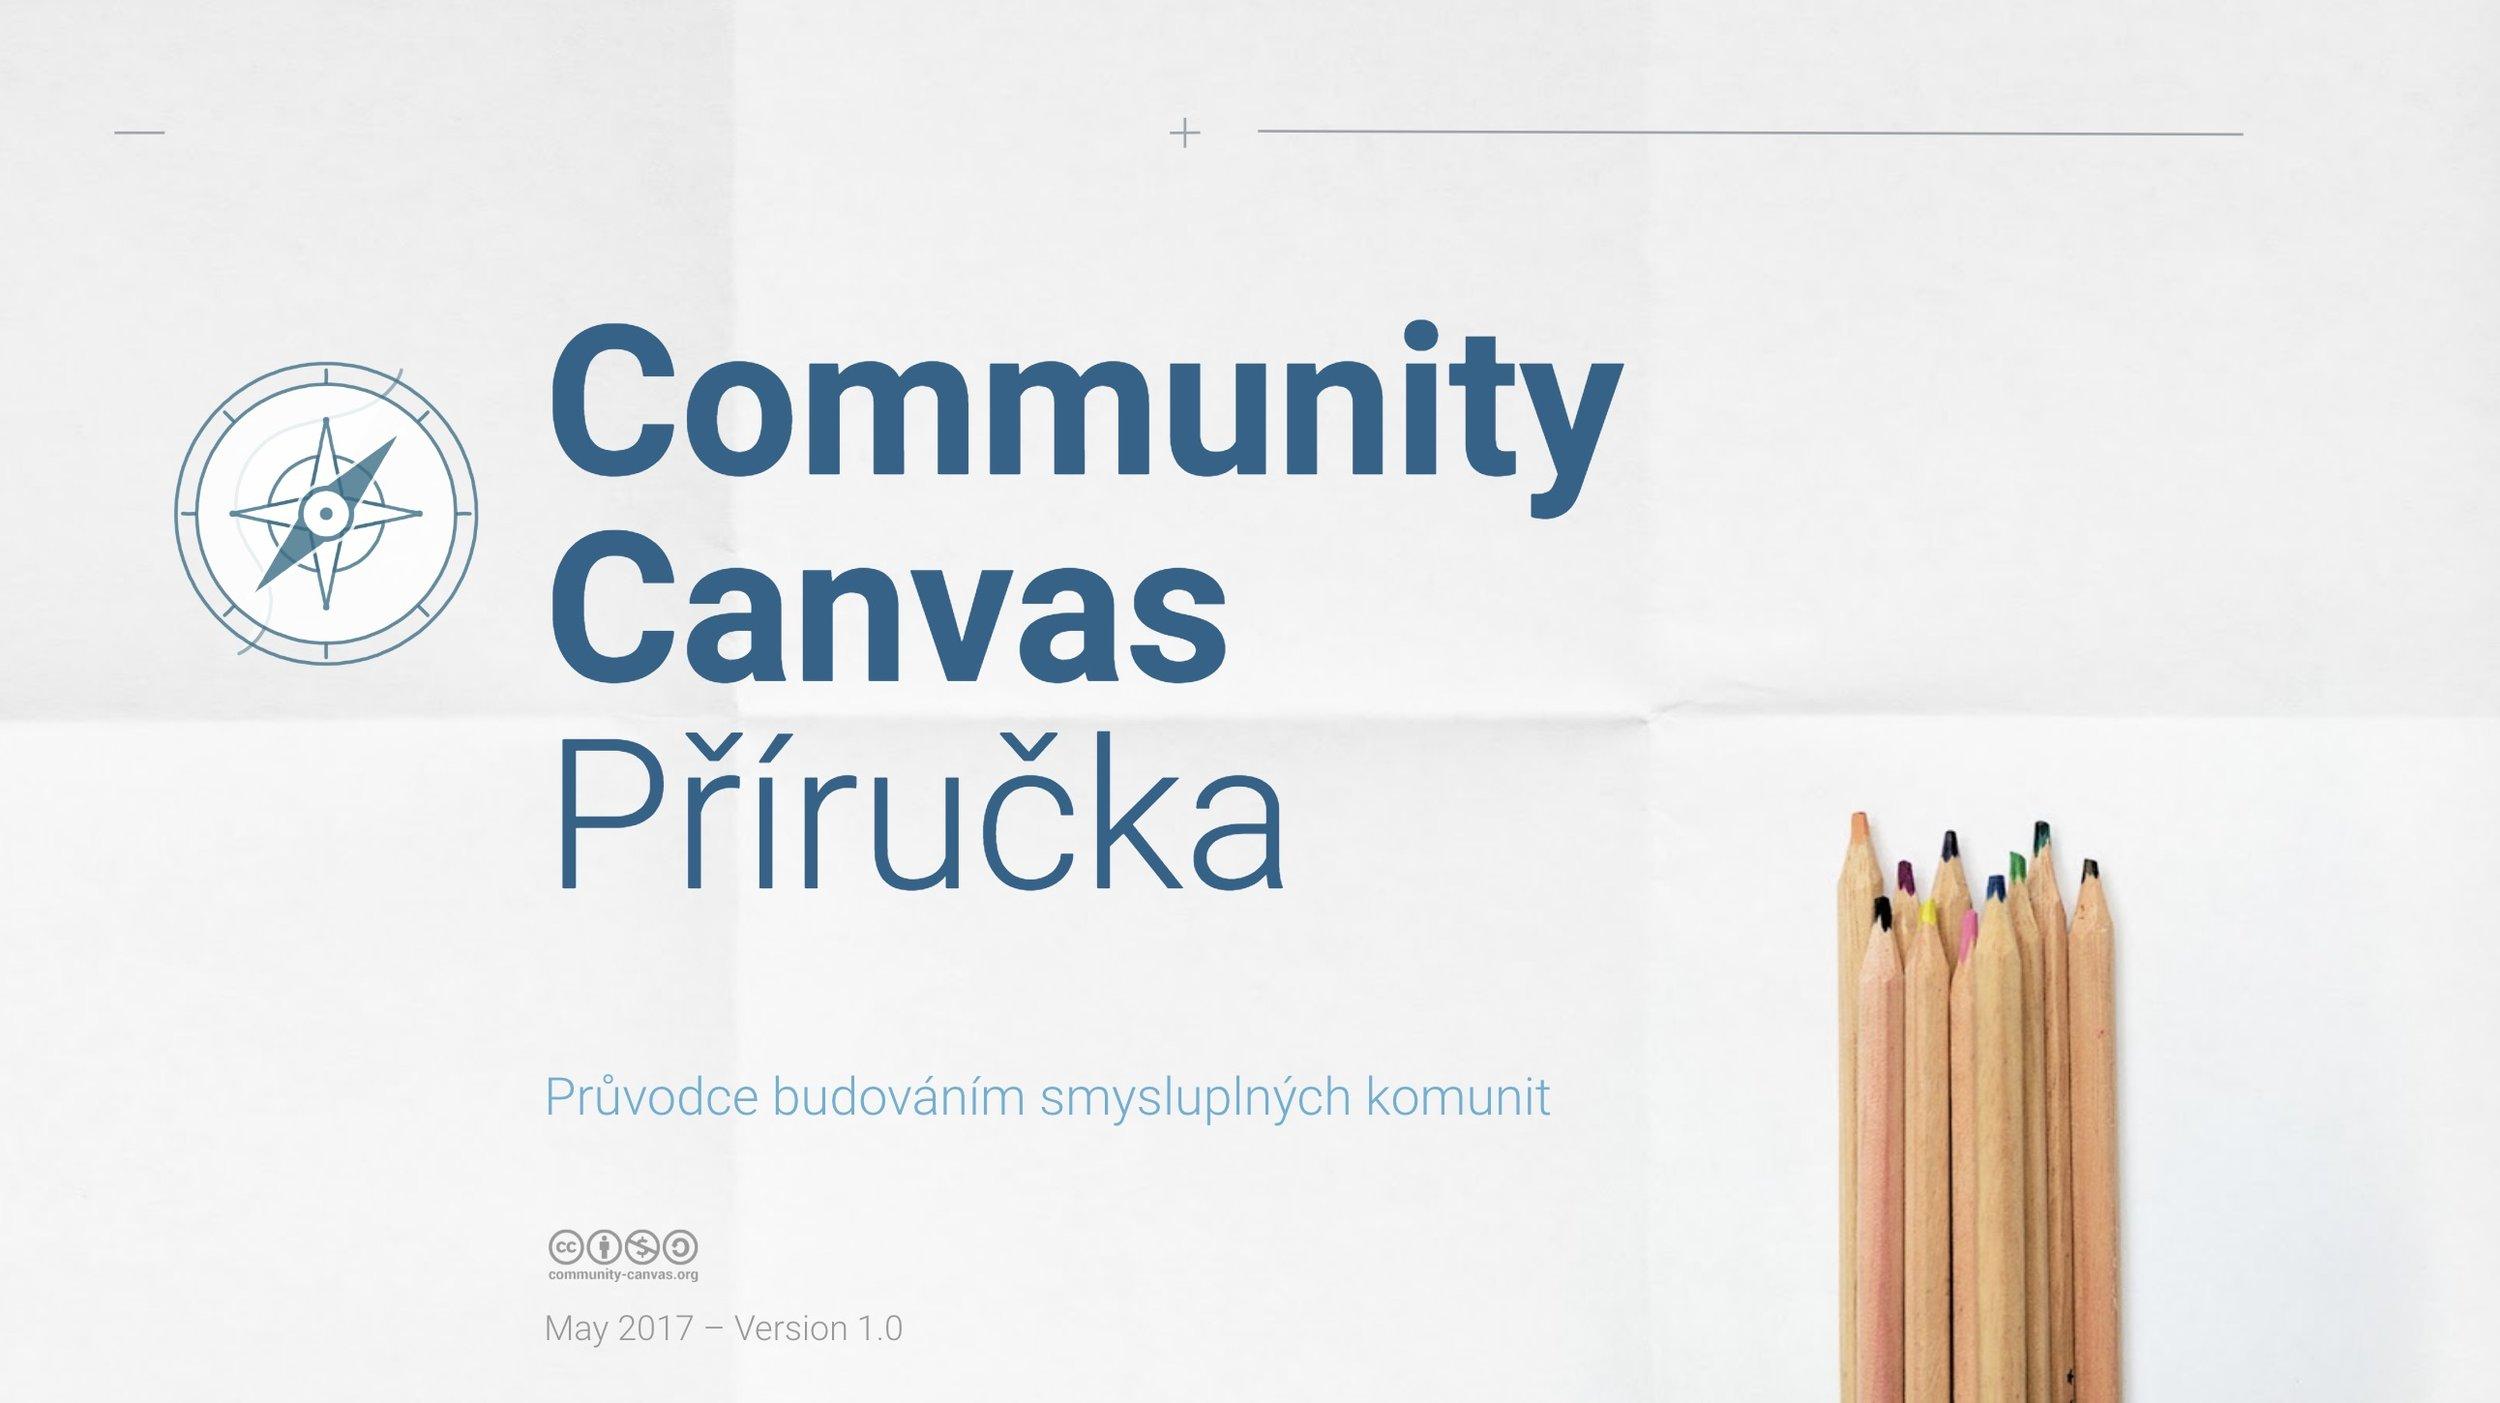 CommunityCanavas-Czech.jpg